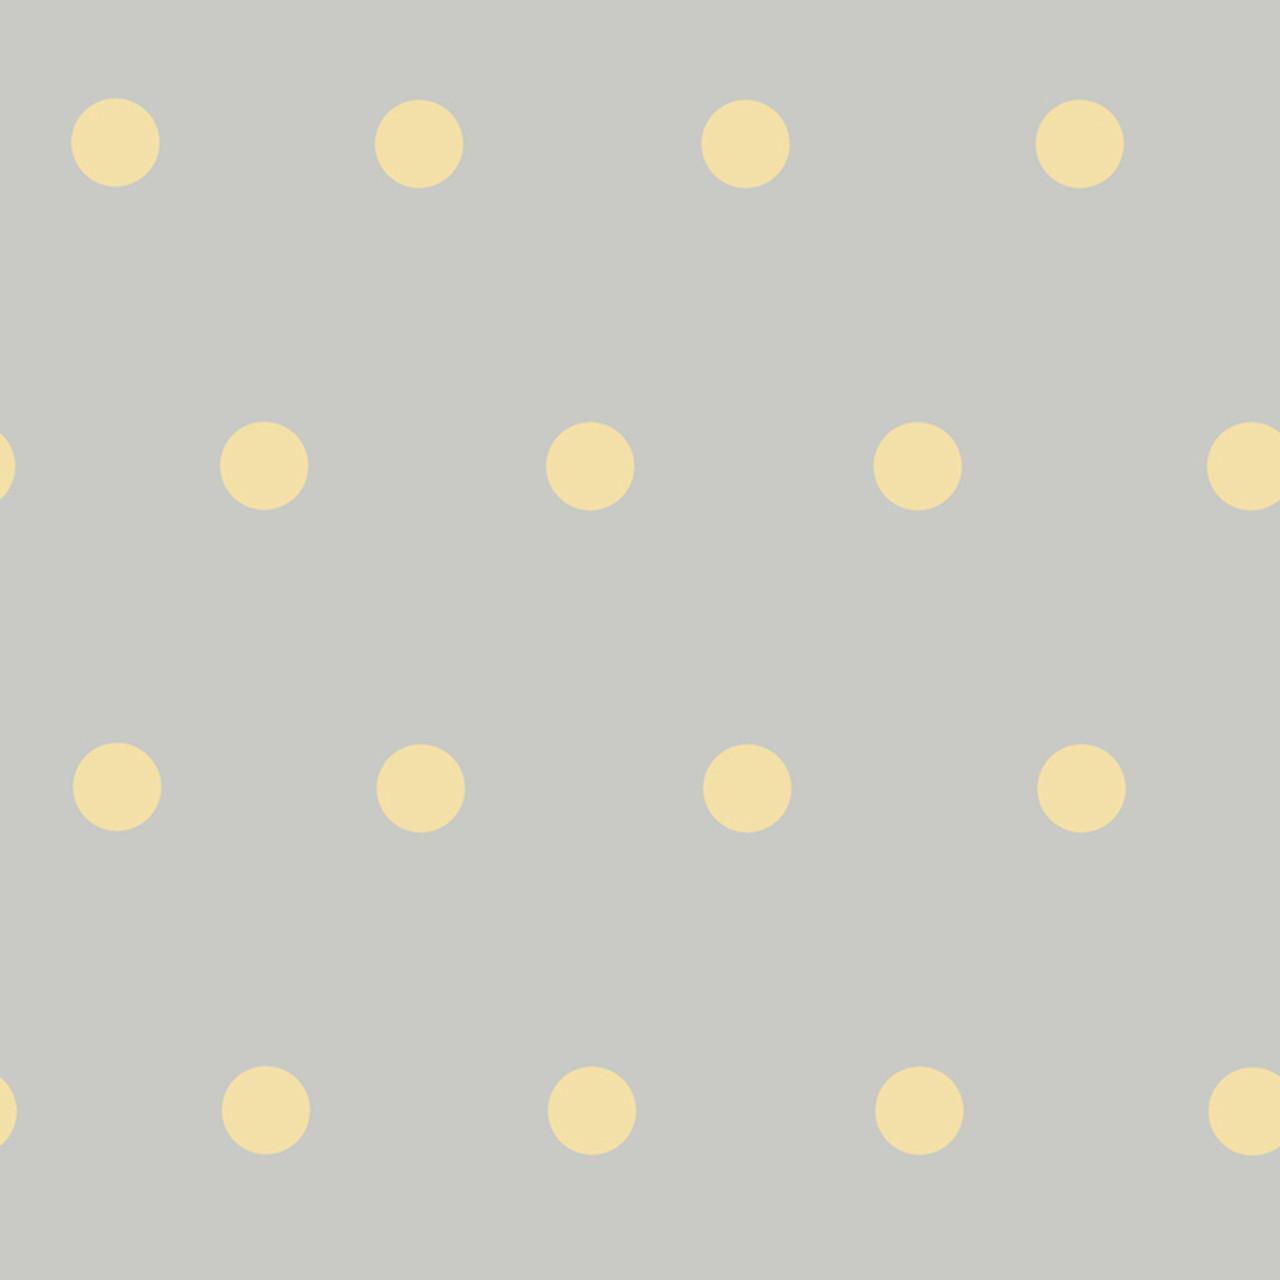 Contemporary Christel Kenley Polka Dots Grey Yellow Wallpaper Chr11714 Indoorwallpaper Com